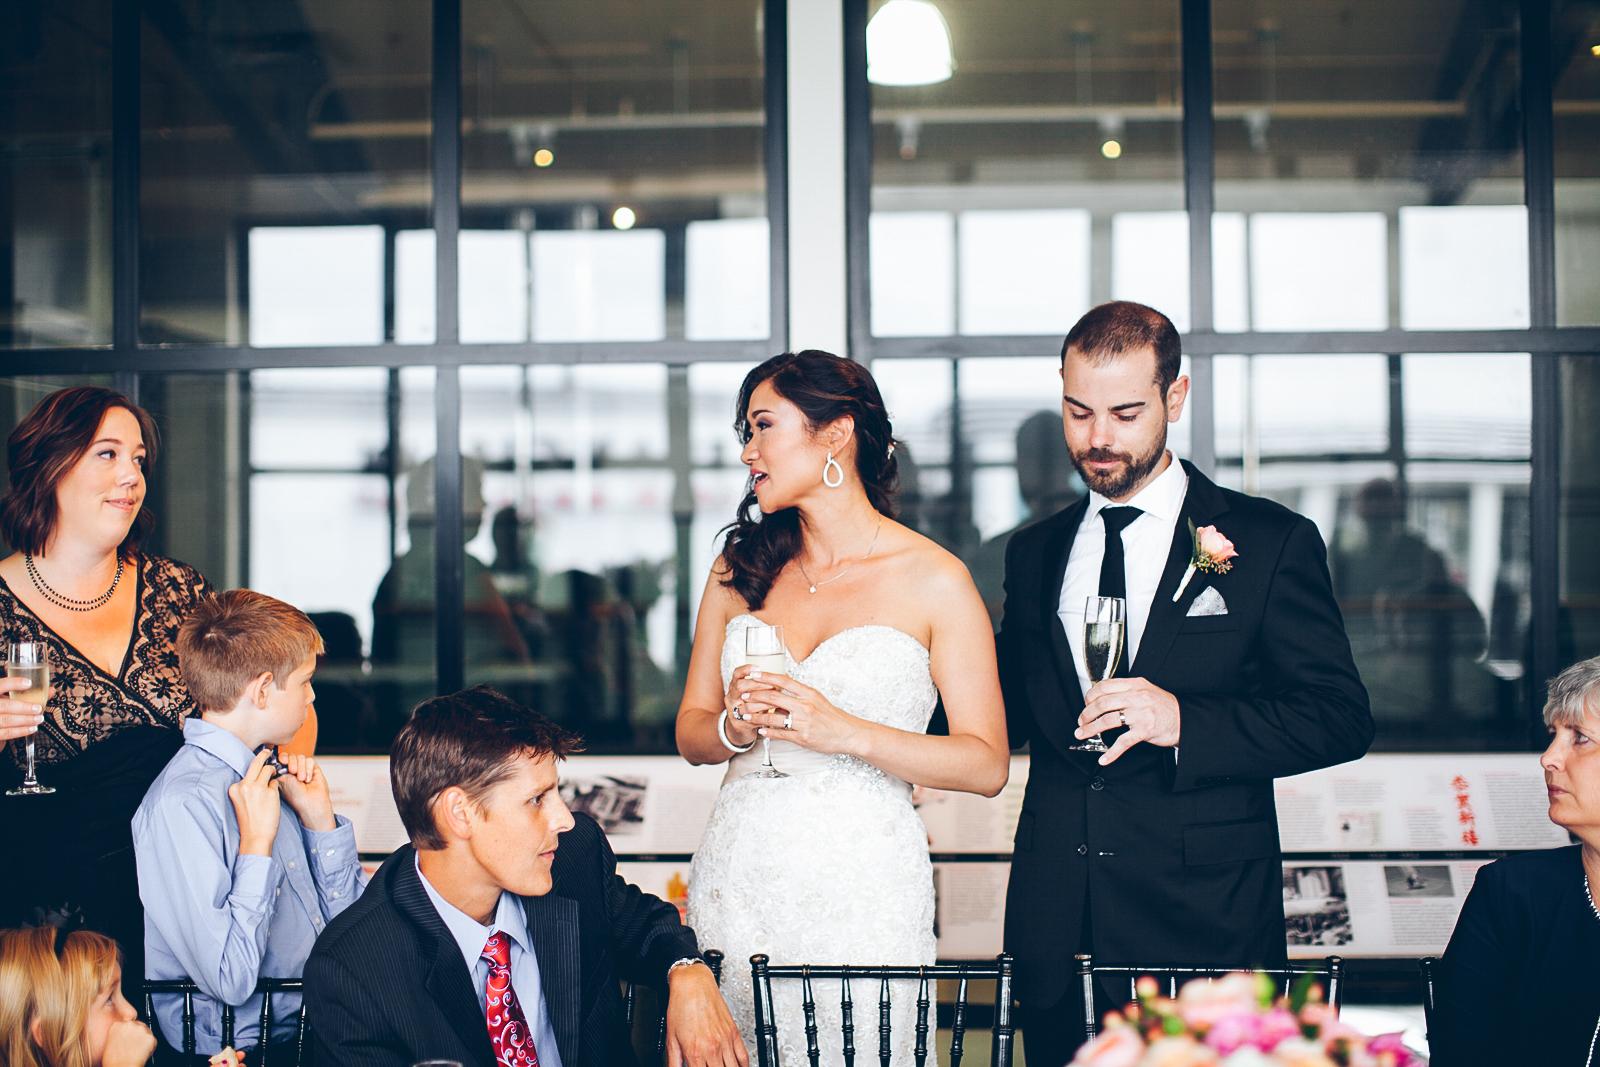 San_francisco_city_hall_wedding_photography_meegan_travis_ebony_siovhan_bokeh_photography_76.jpg